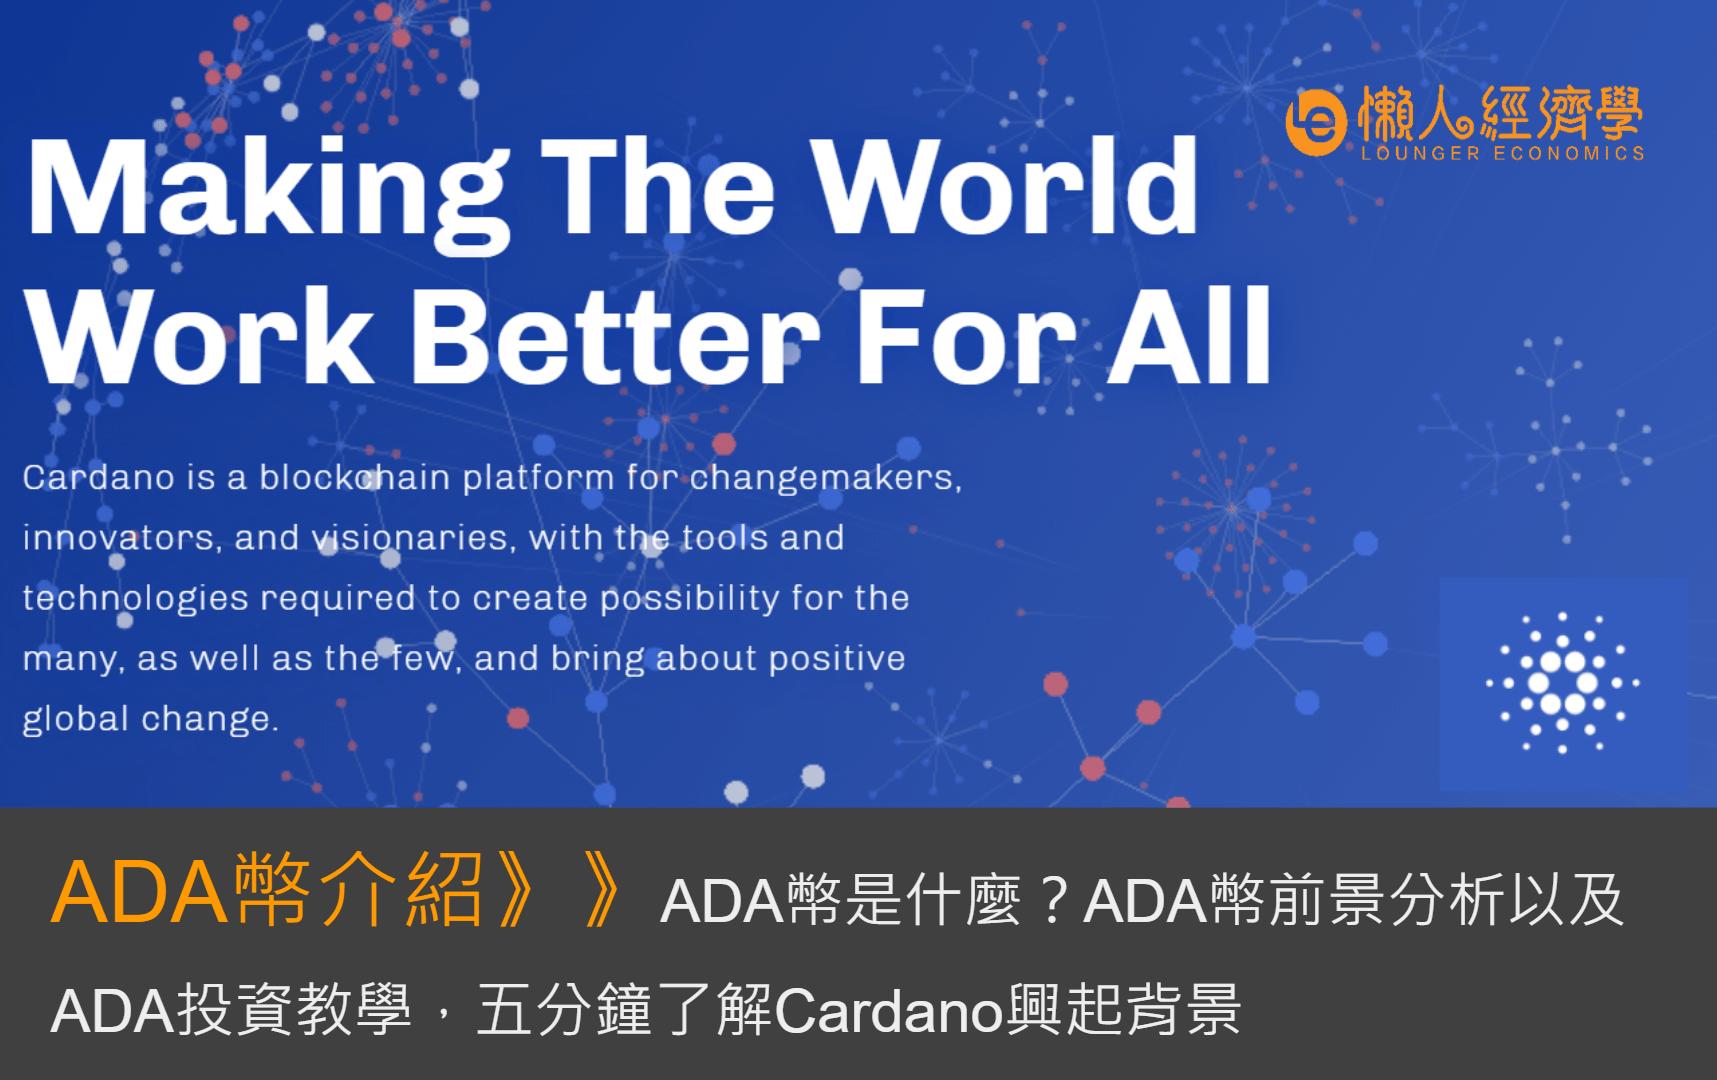 ADA幣是什麼?ADA幣前景分析以及ADA投資教學,五分鐘了解Cardano興起背景